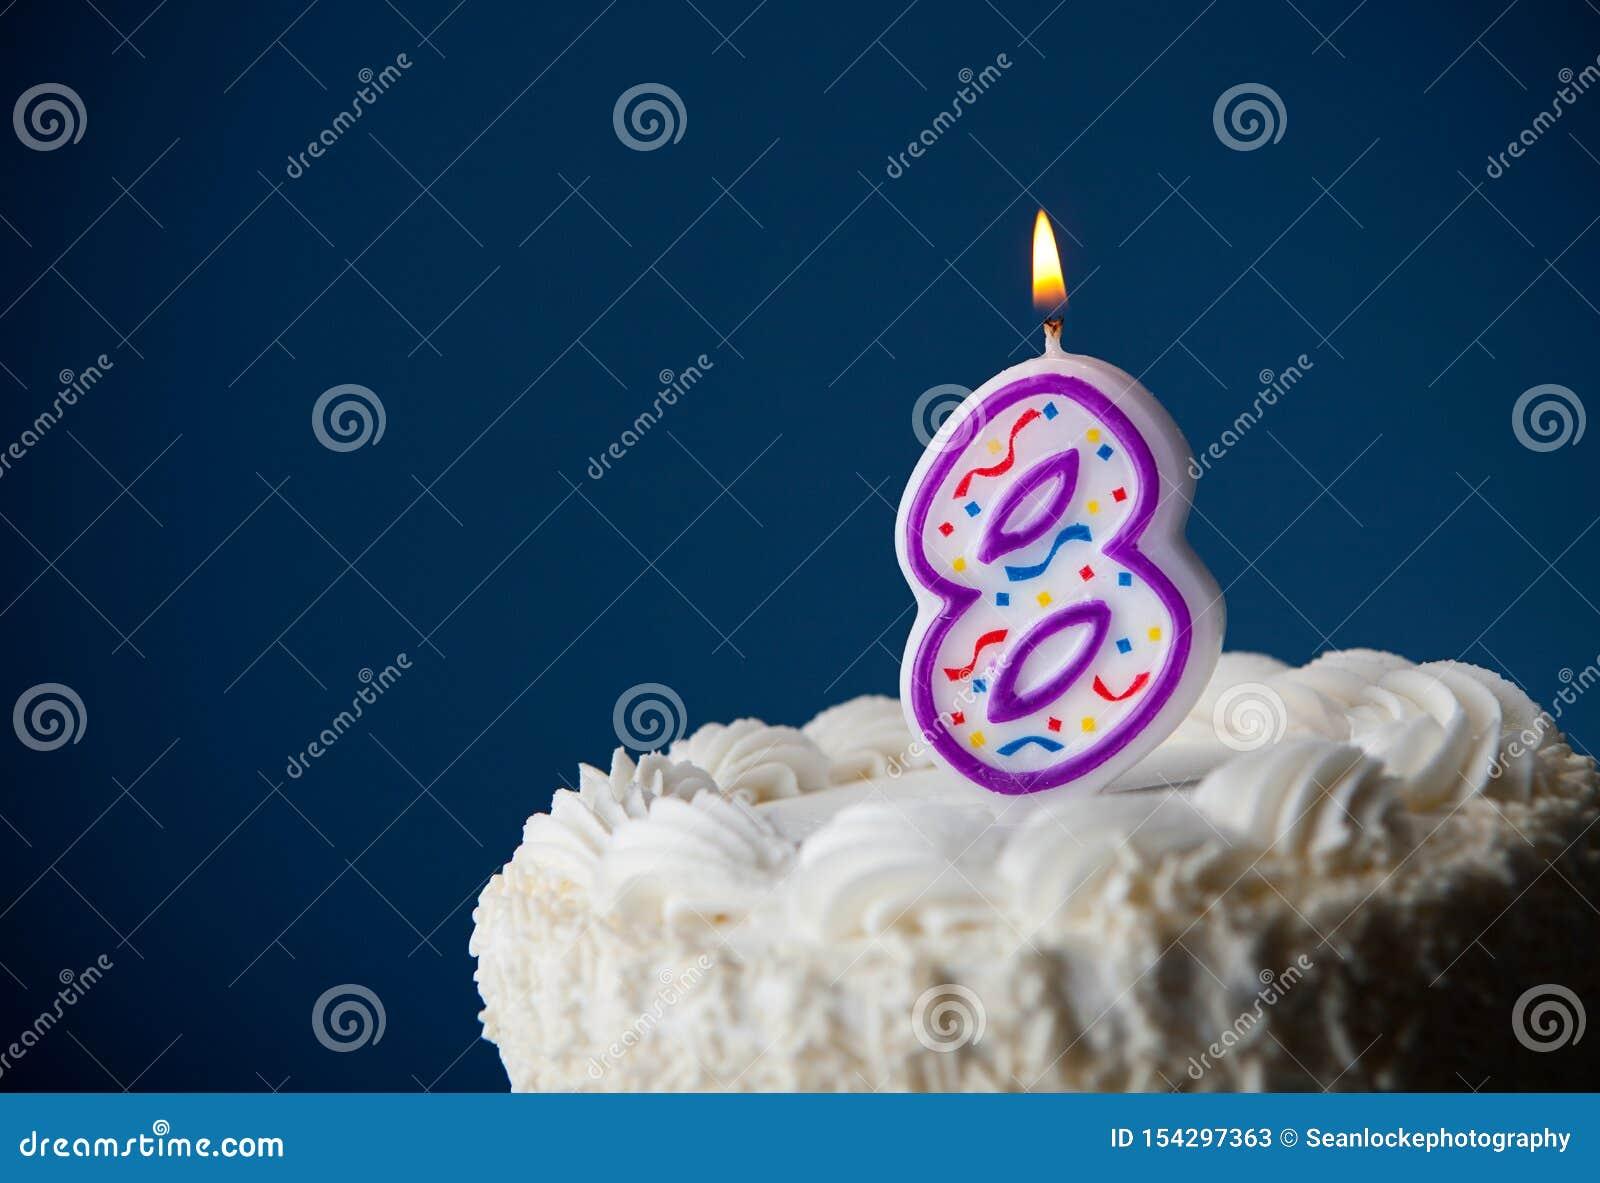 Sensational Cake Birthday Cake With Candles For 8Th Birthday Stock Image Personalised Birthday Cards Veneteletsinfo